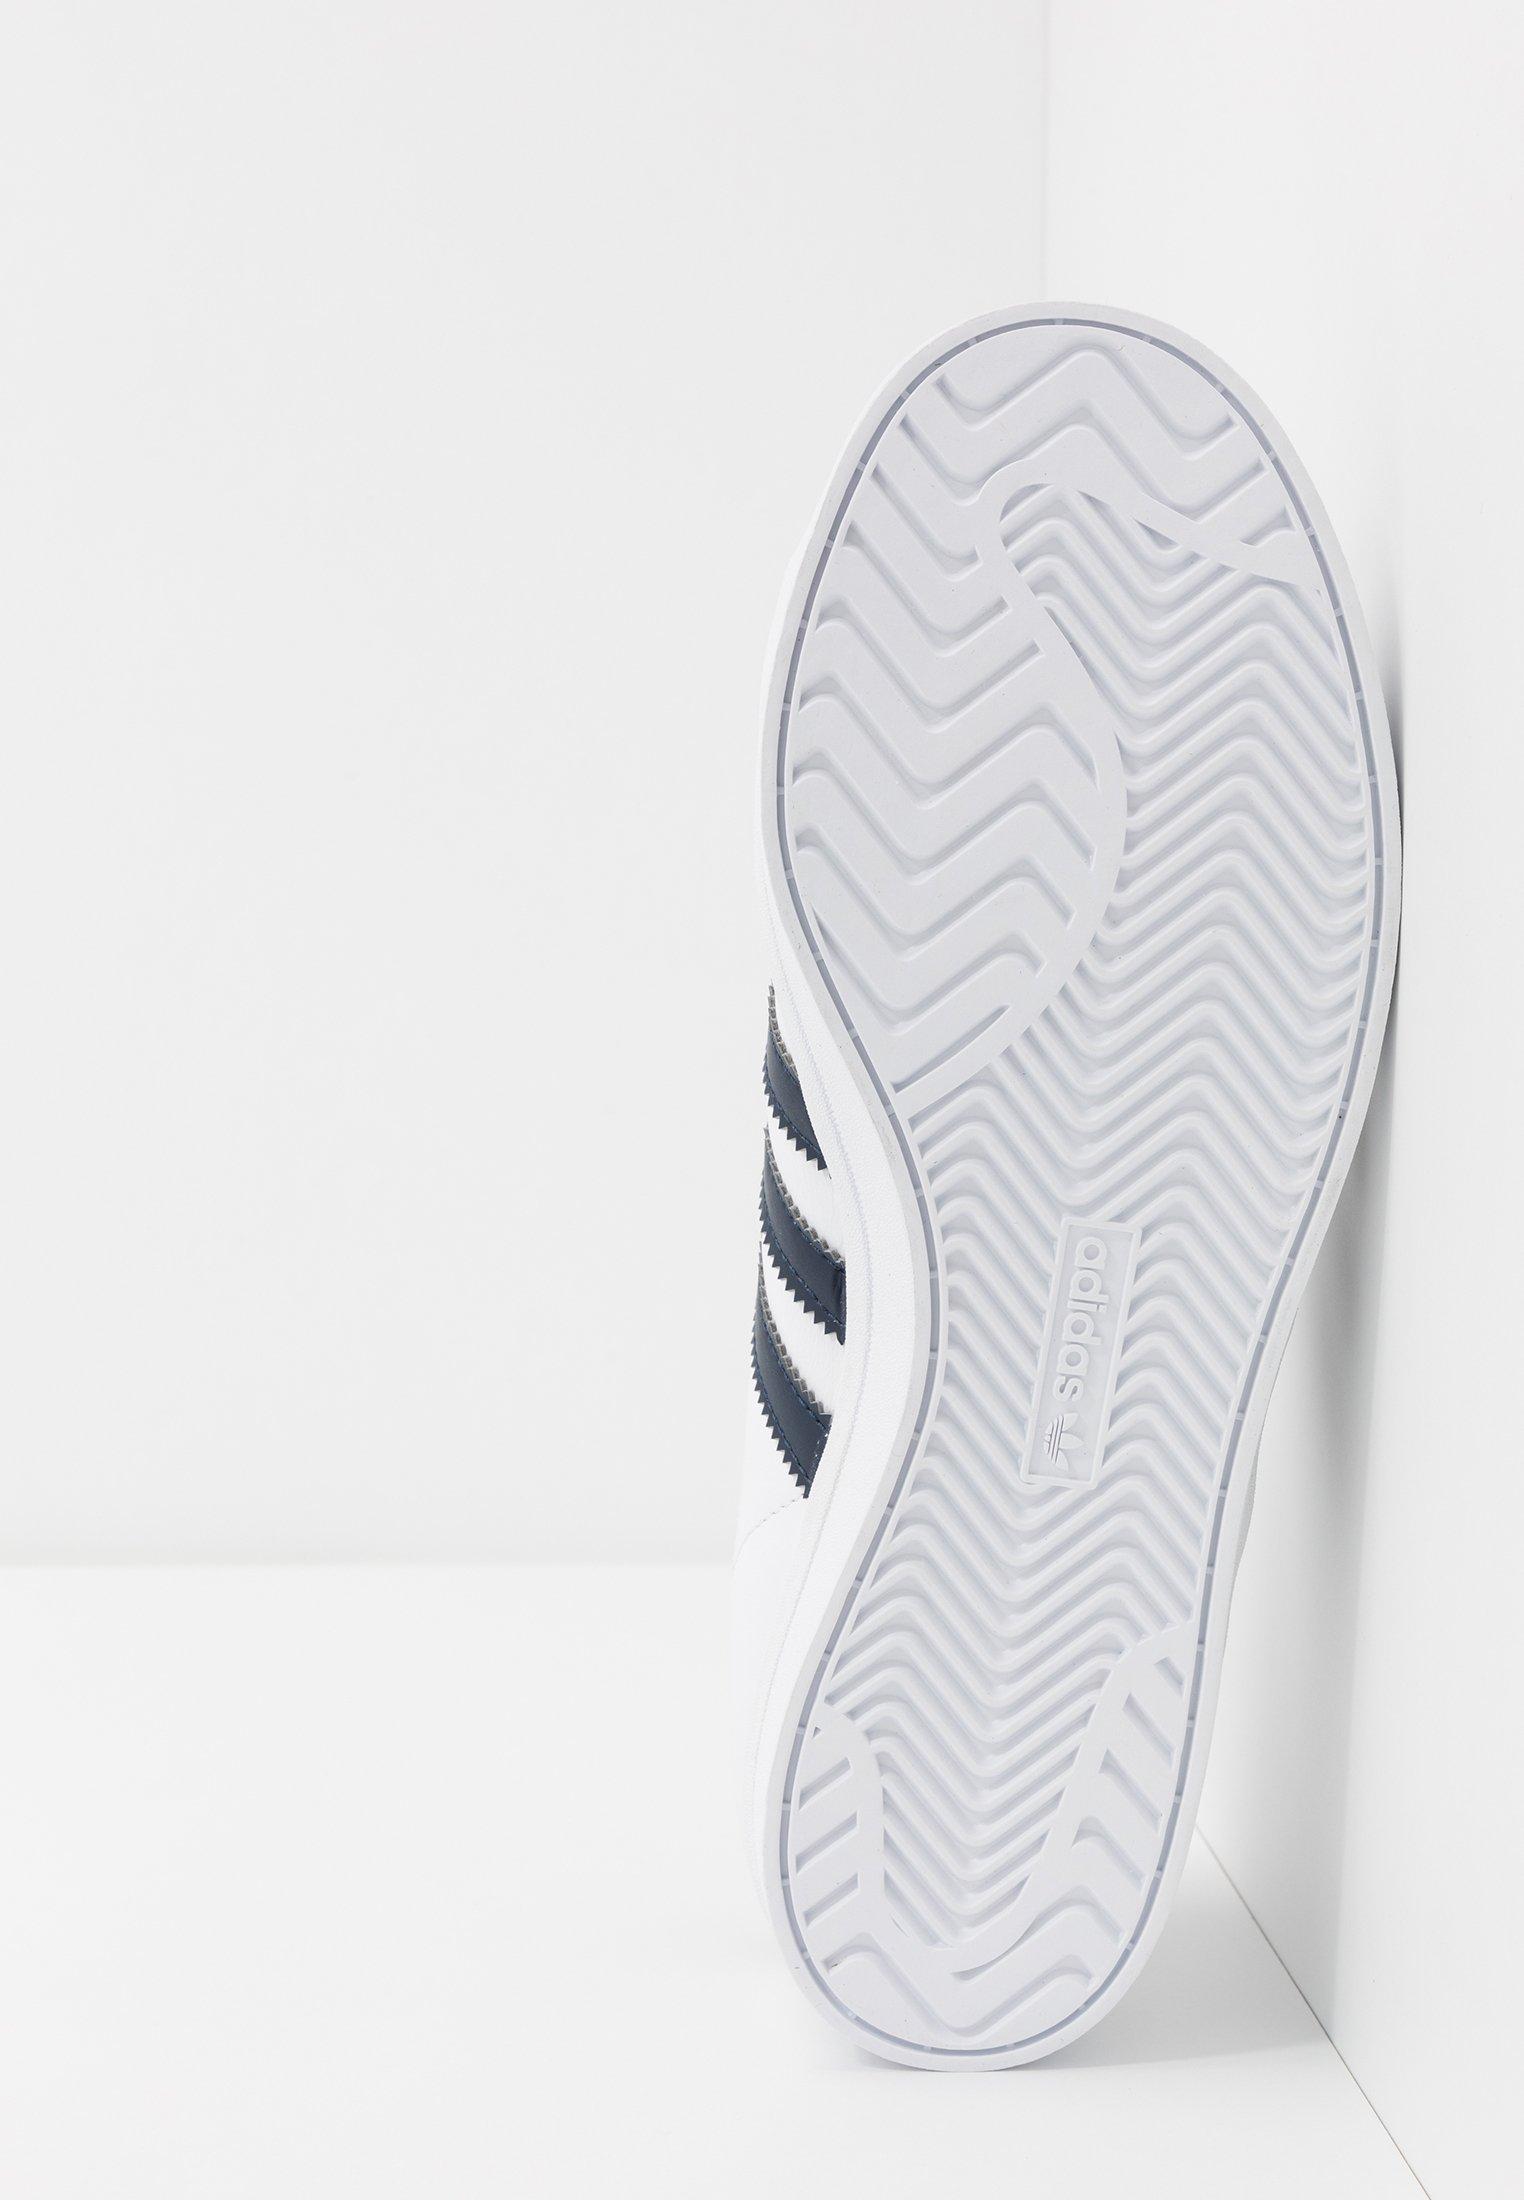 footware Originals STARBaskets collegiate adidas COAST navy basses white lFKTc1J